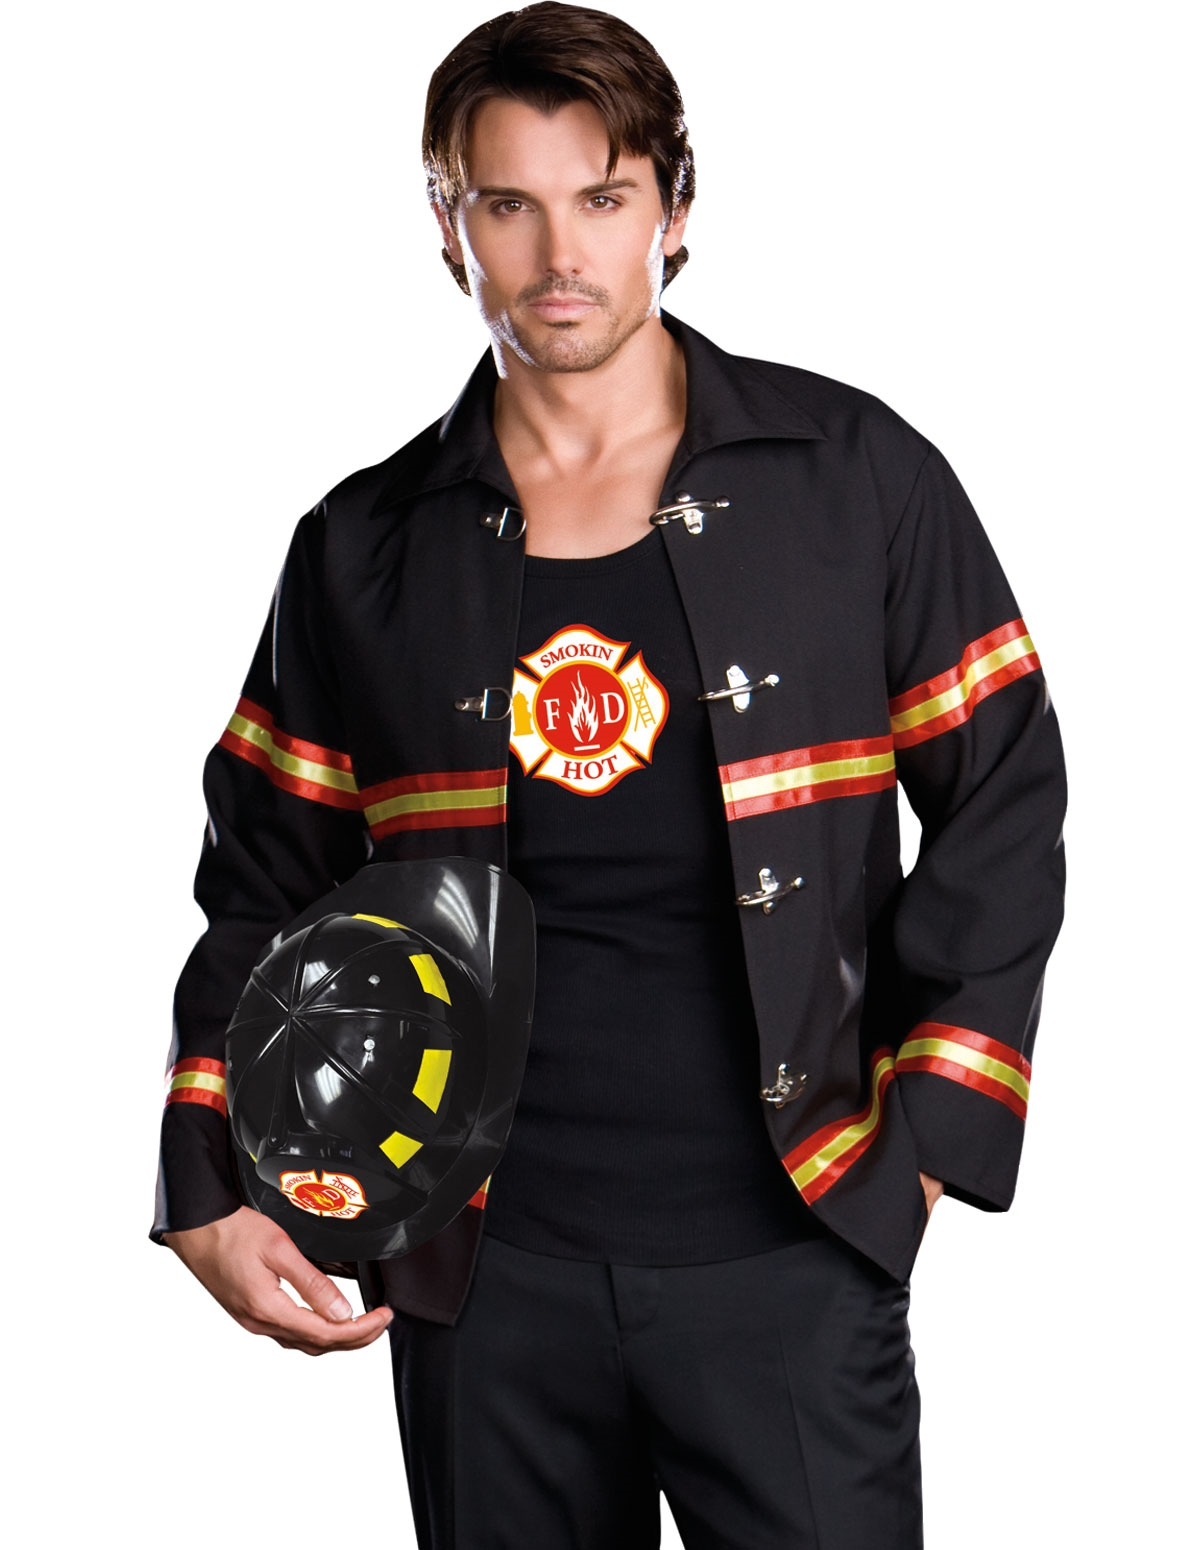 Smokin Hot Fireman